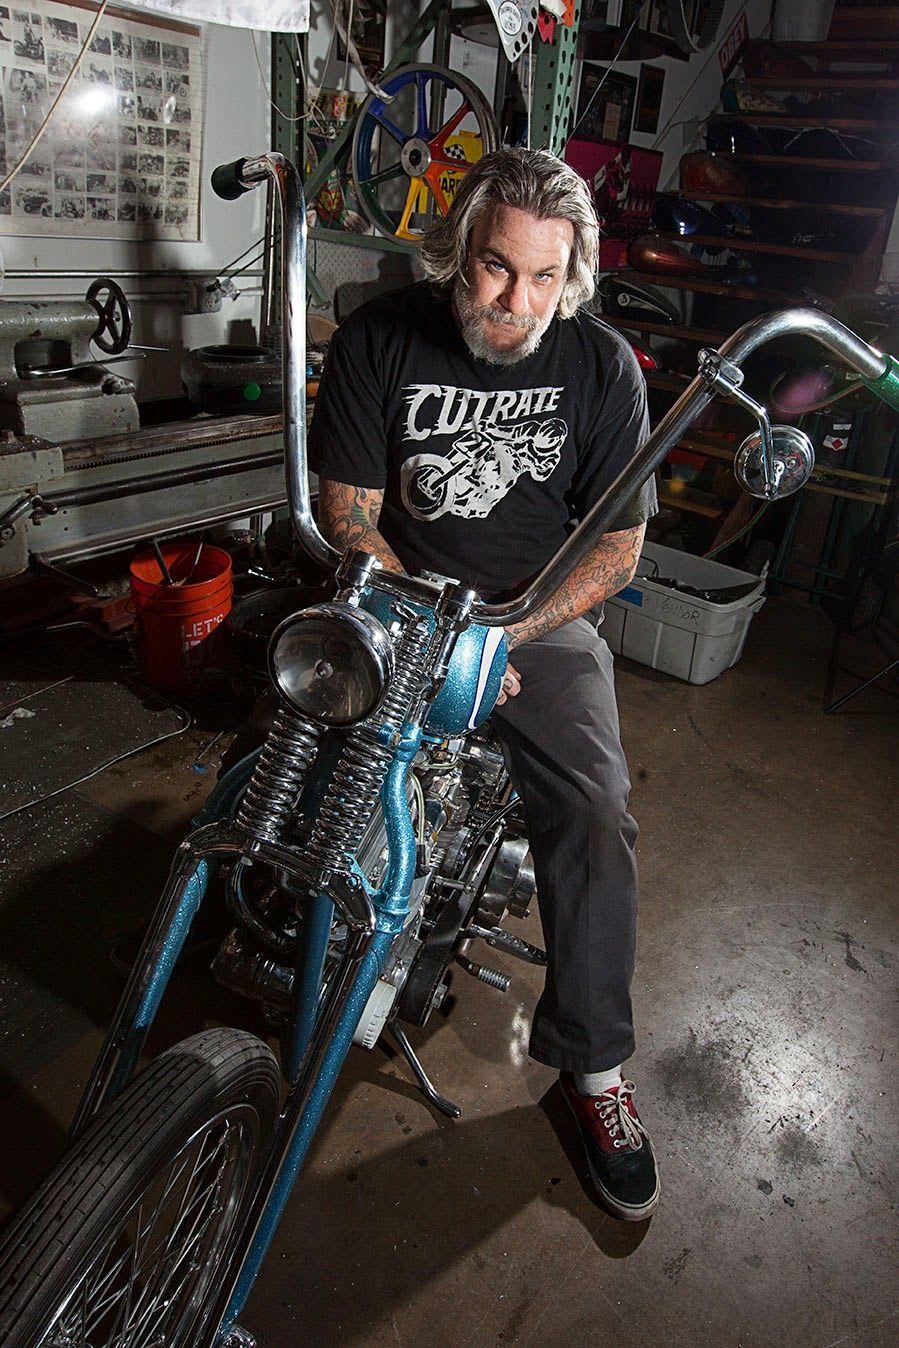 Chopper Dave Support Page Chopper Bike Builder Supportive